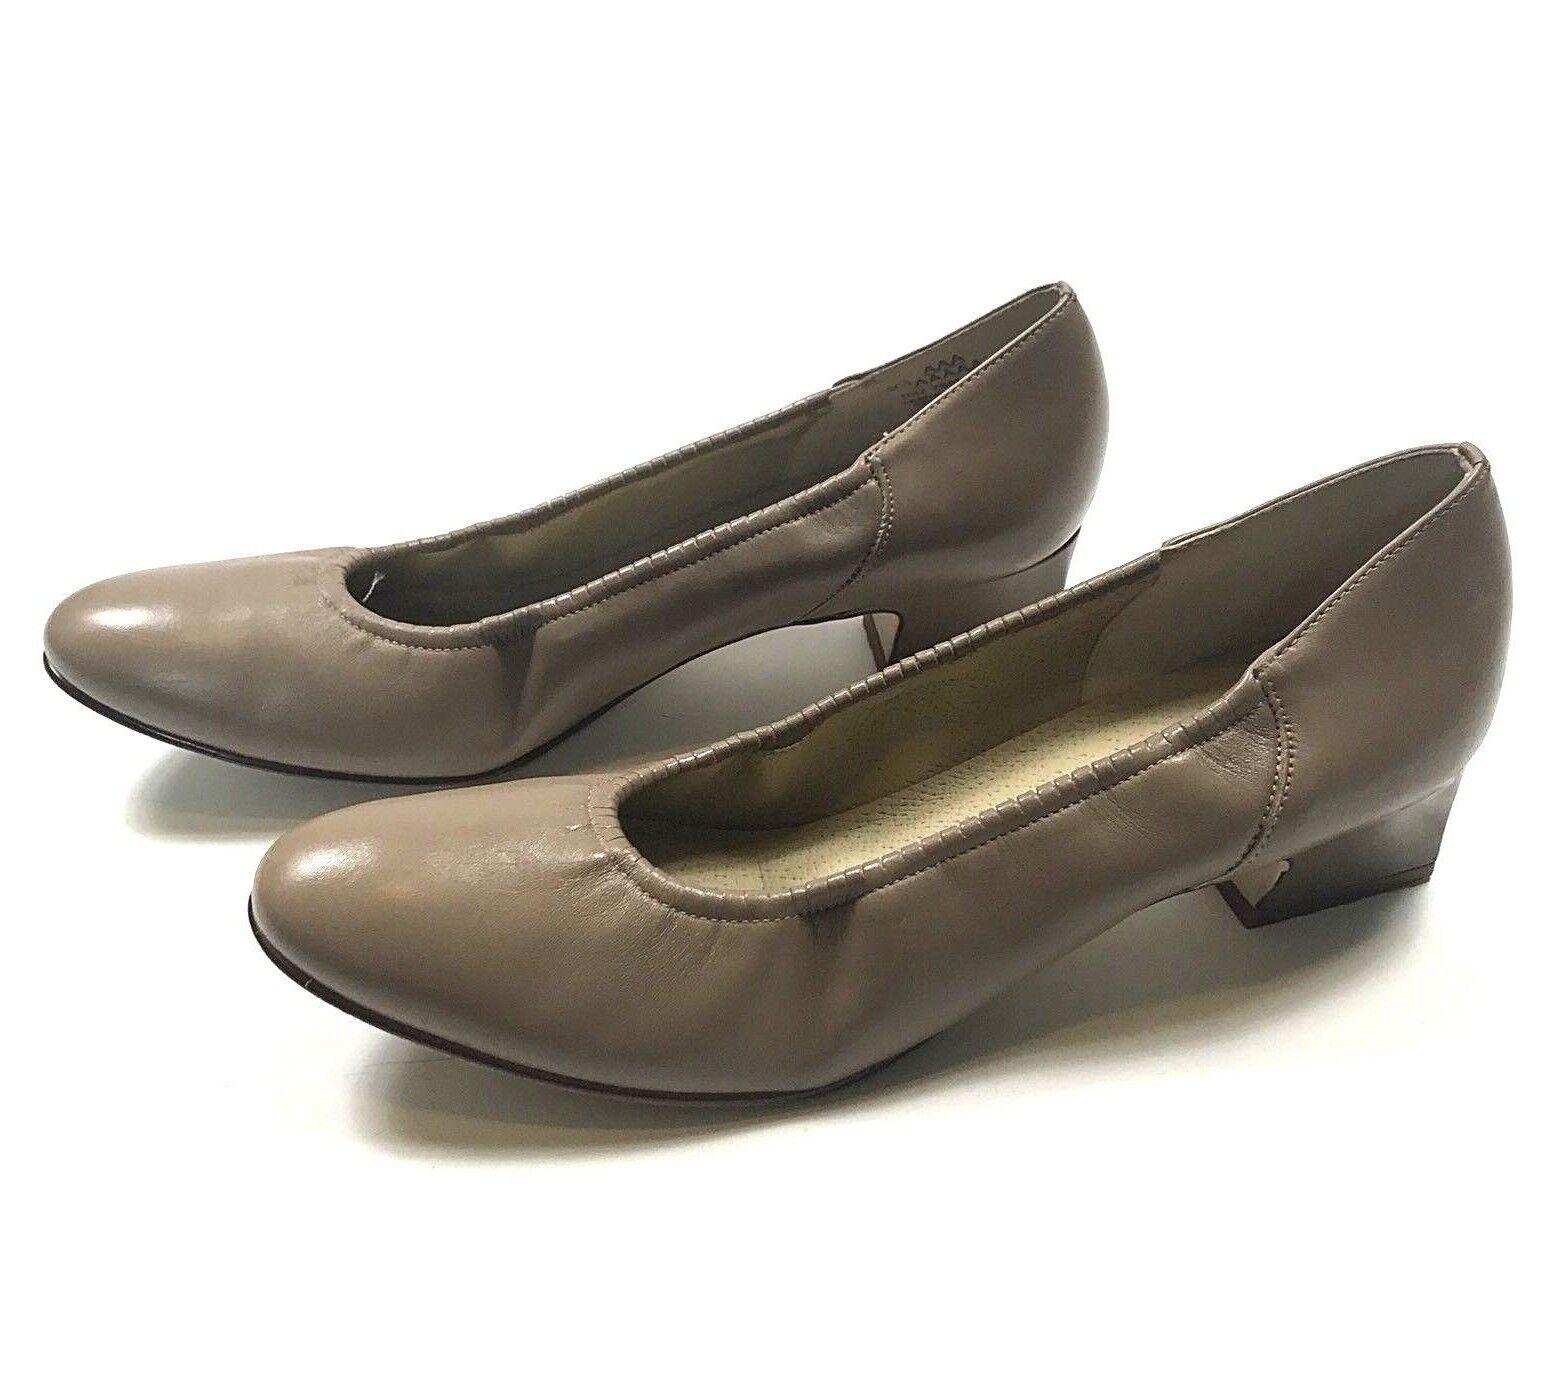 Naturalizer Womens Comfort Shoes Block Heels Slip On Tan Tan On 9.5 AAA Extra Narrow f3e3f0